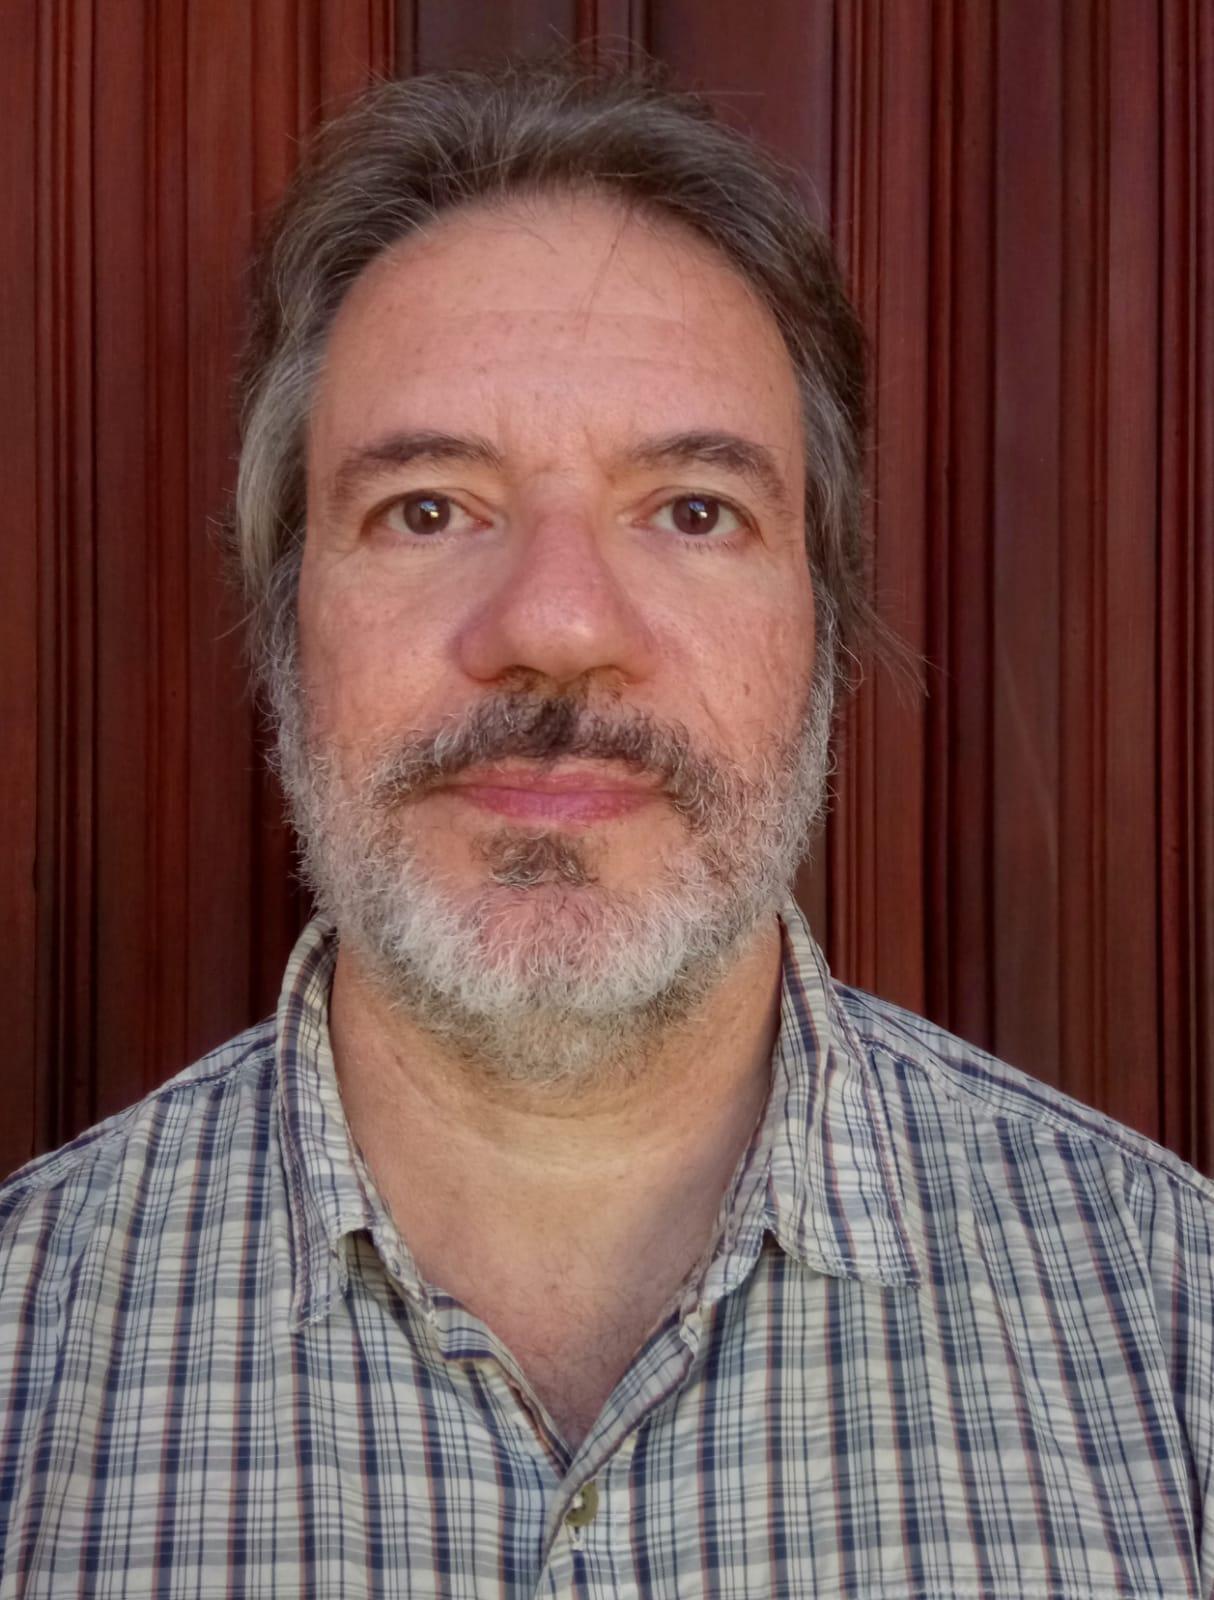 Ricardo Jullian da Silva Graça